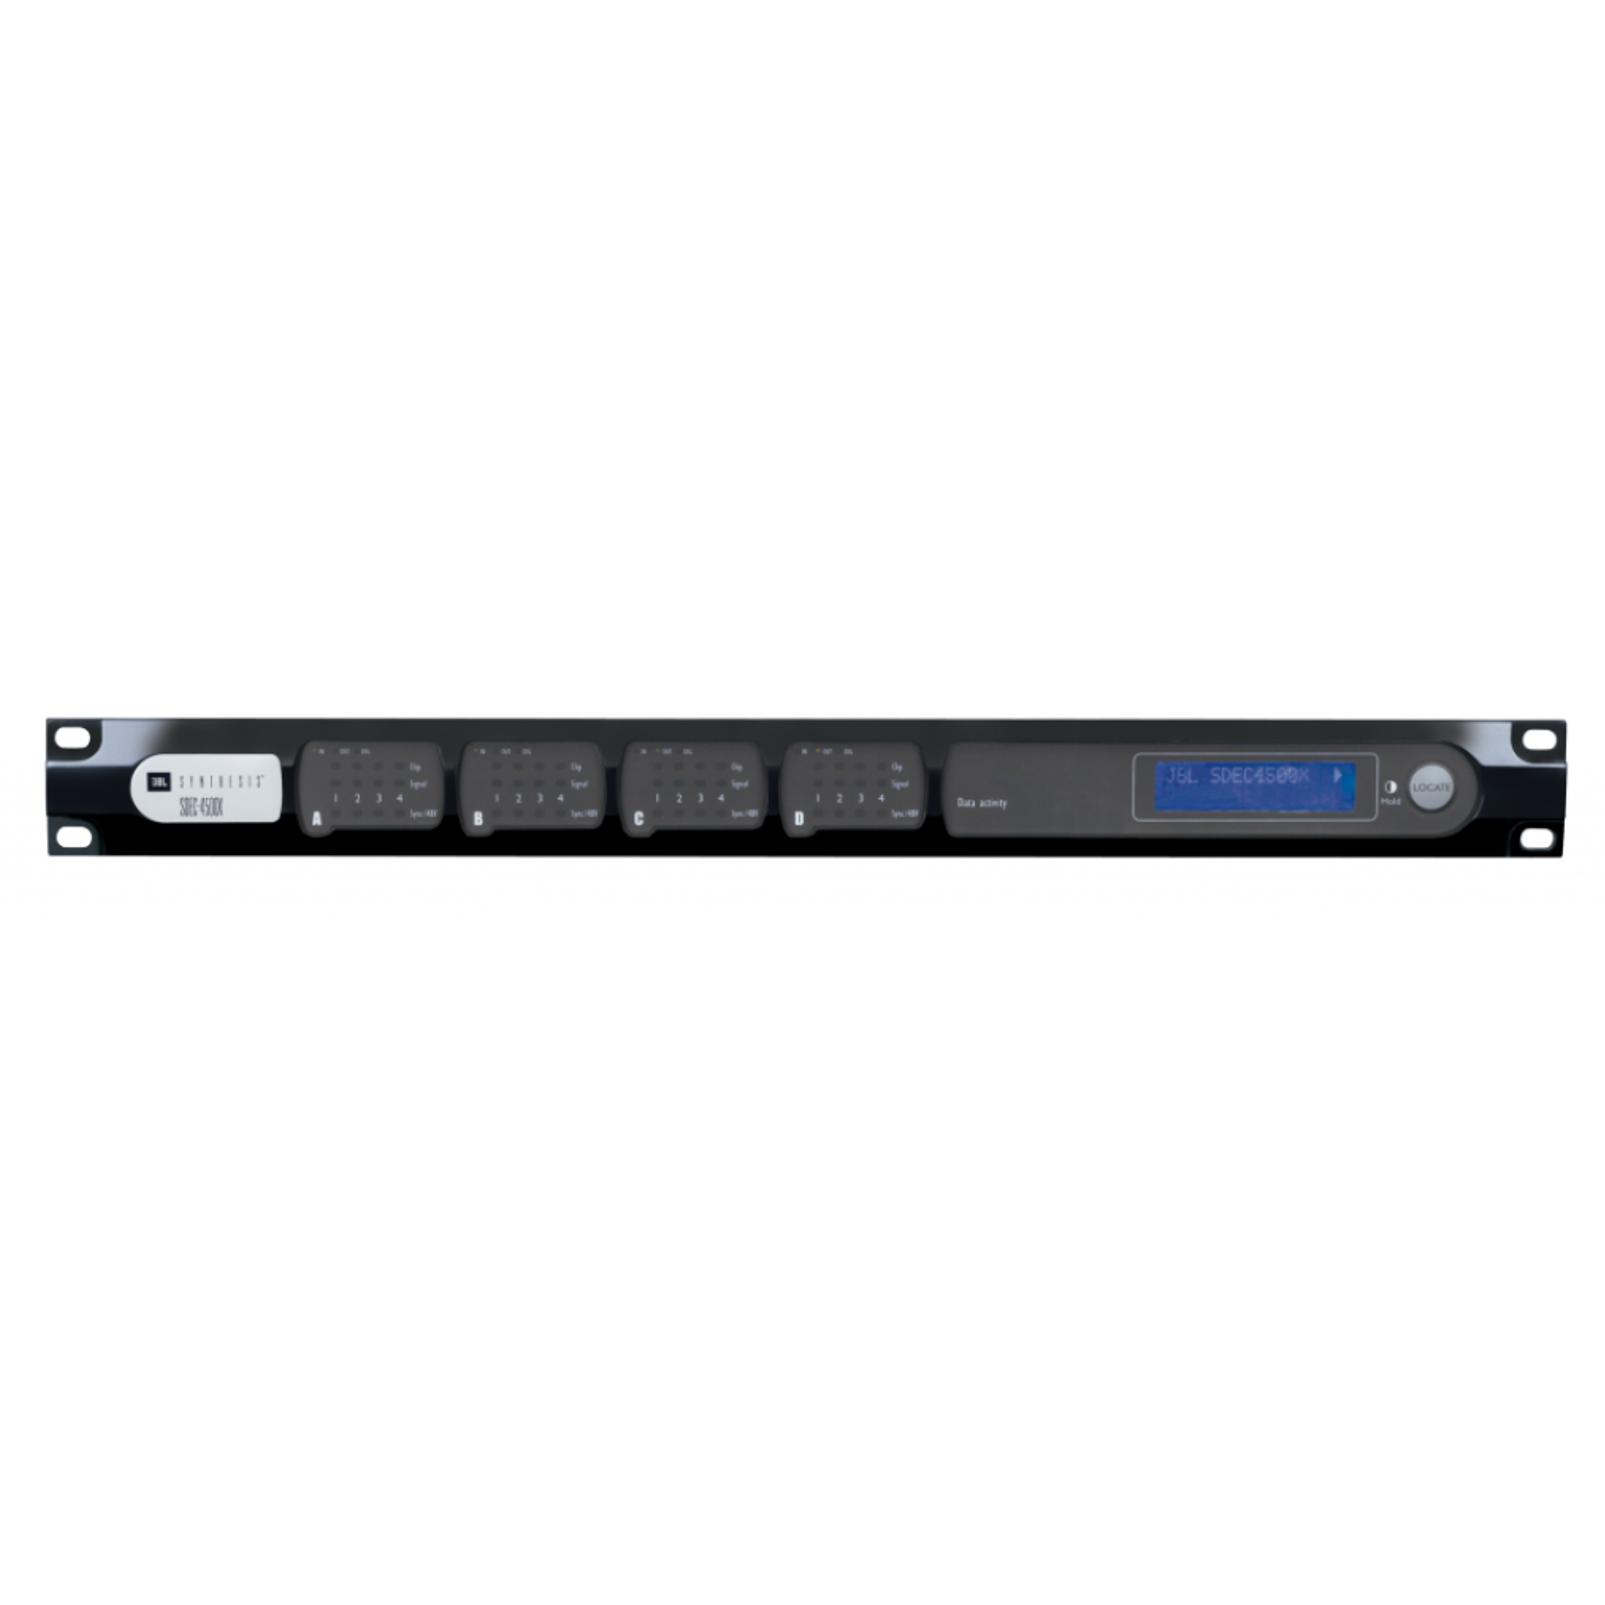 SDEC-4500X